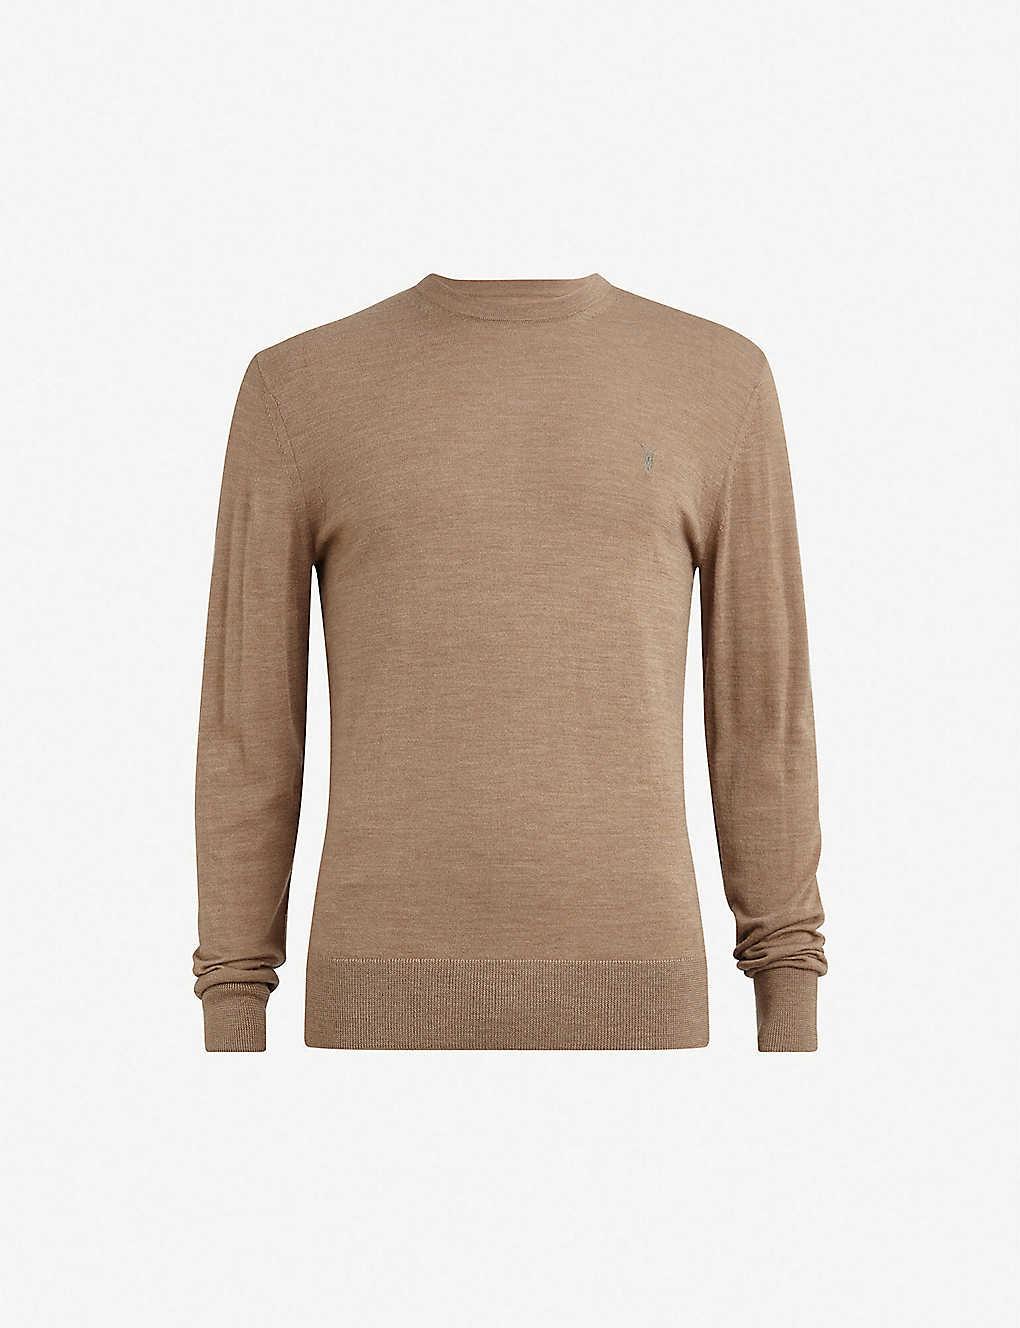 a3a8513148edf6 ALLSAINTS - Mode merino wool jumper | Selfridges.com